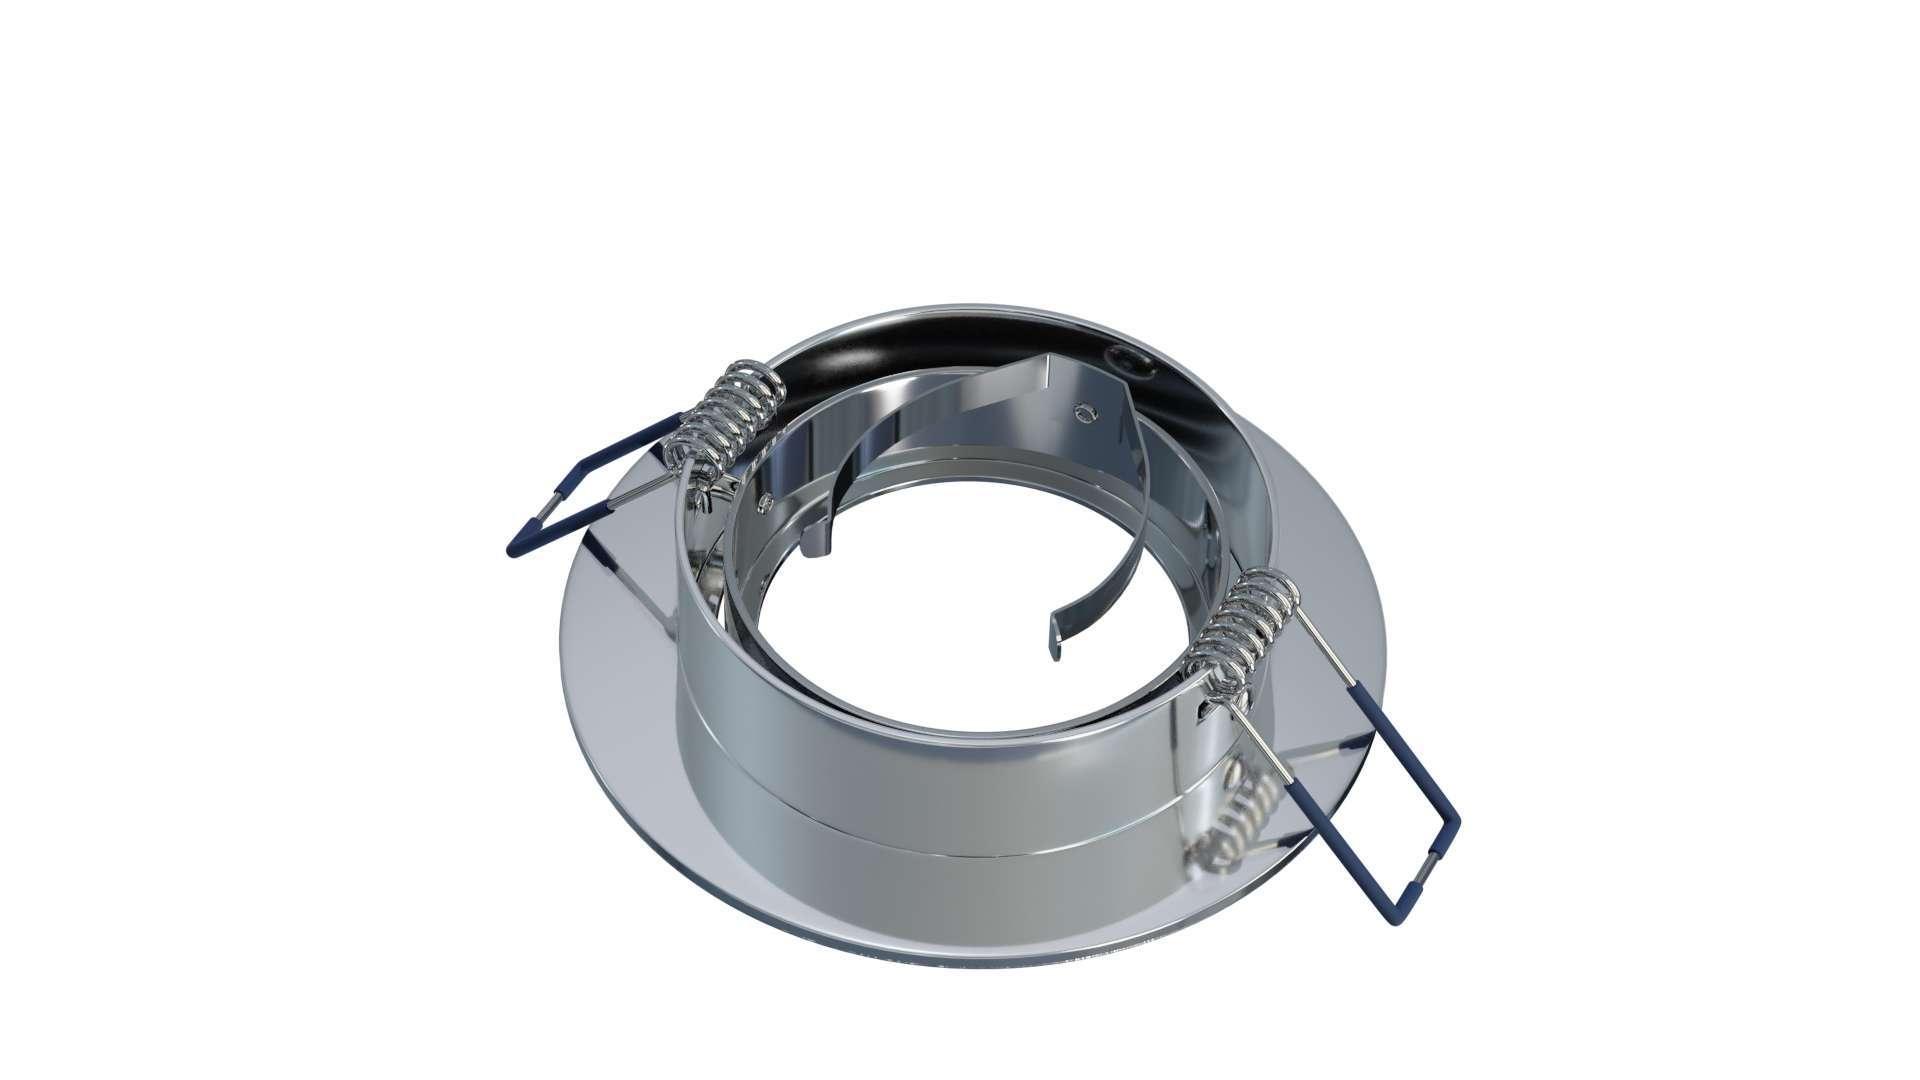 Oprawa MULO okrągła ruchoma srebrna szczot.